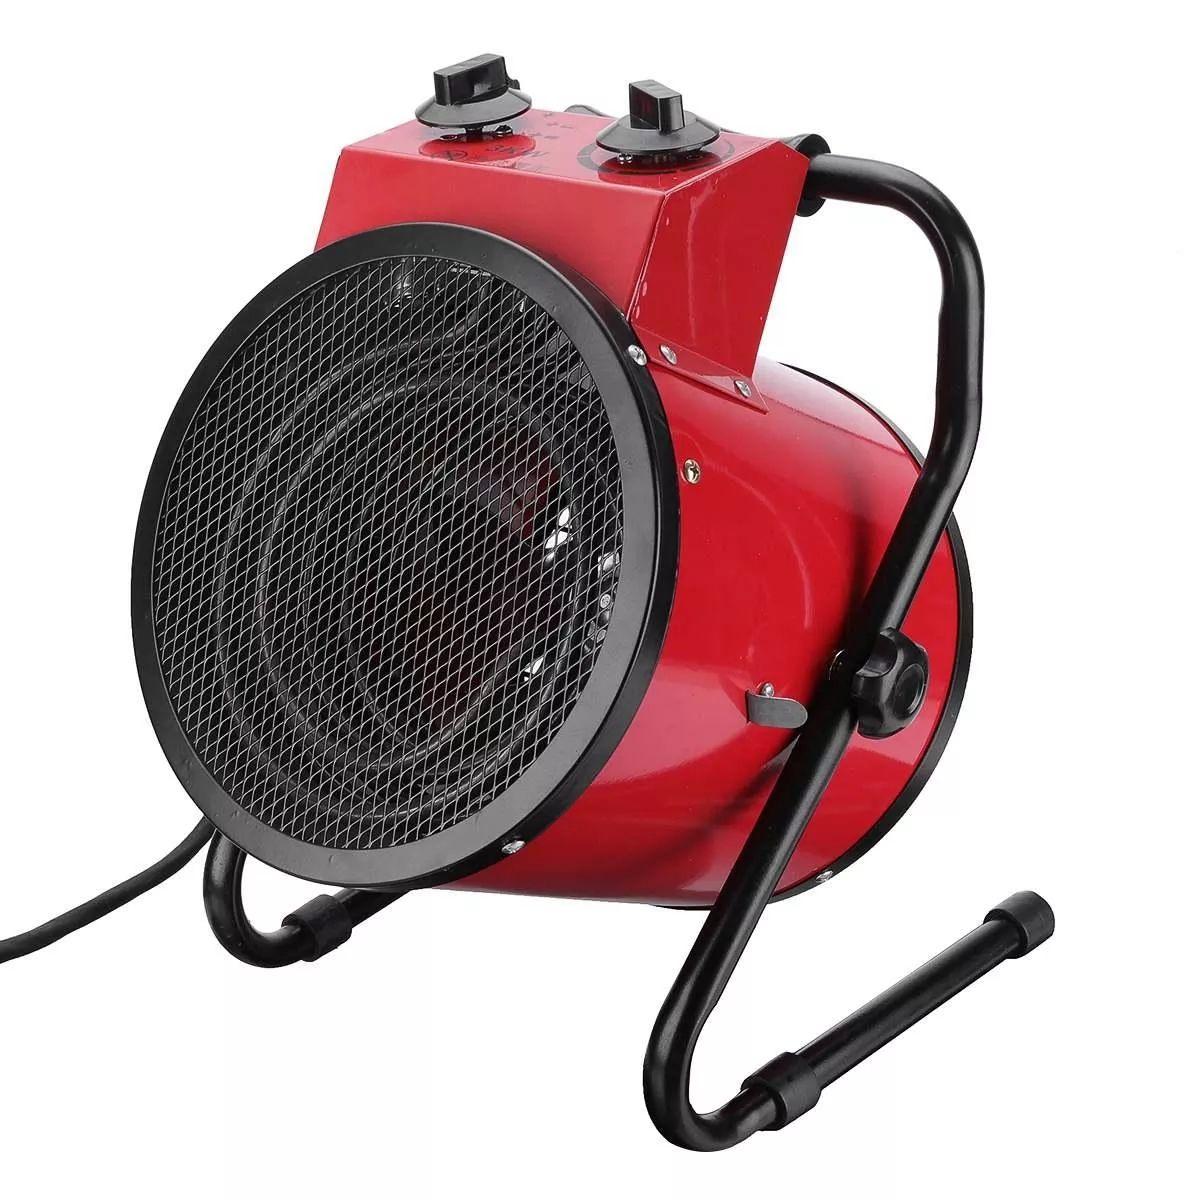 3KW 220V Industrial Electric Heater Fan Heavy Duty Air Heater Adjustable Commercial Warm Air Blower